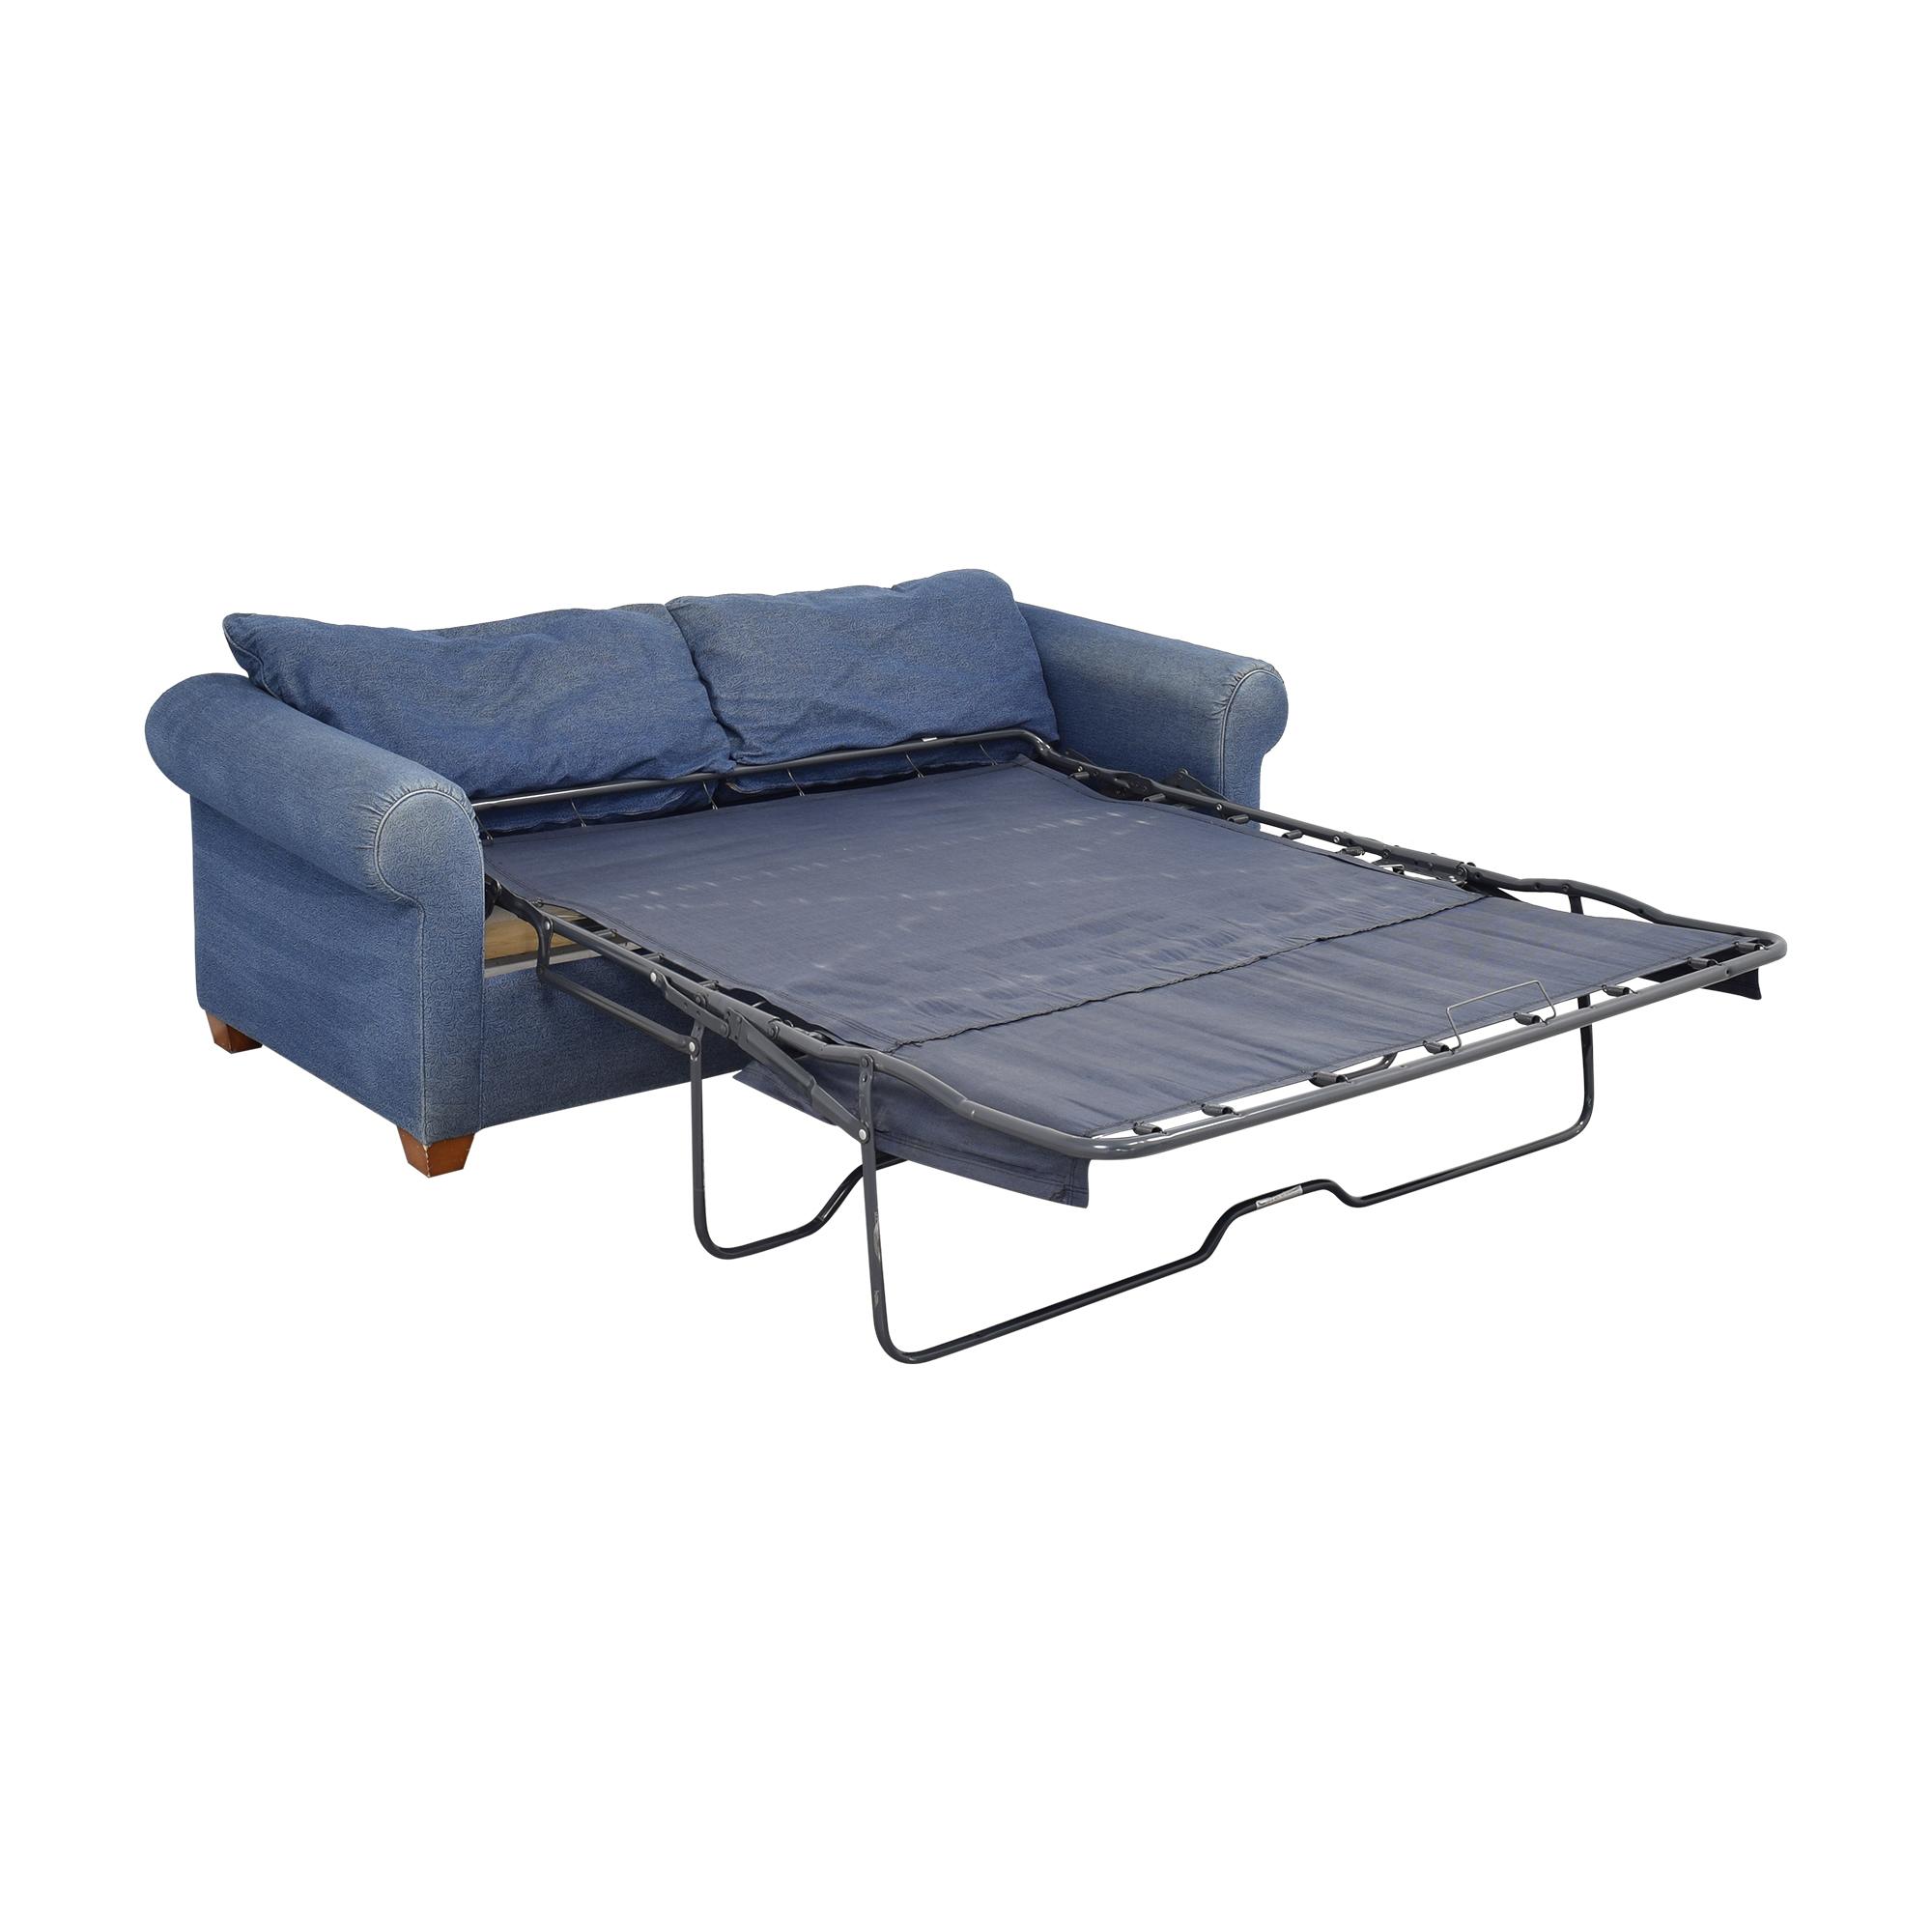 shop Leggett & Platt Leggett & Platt Denim Queen Pull Out Sofa online